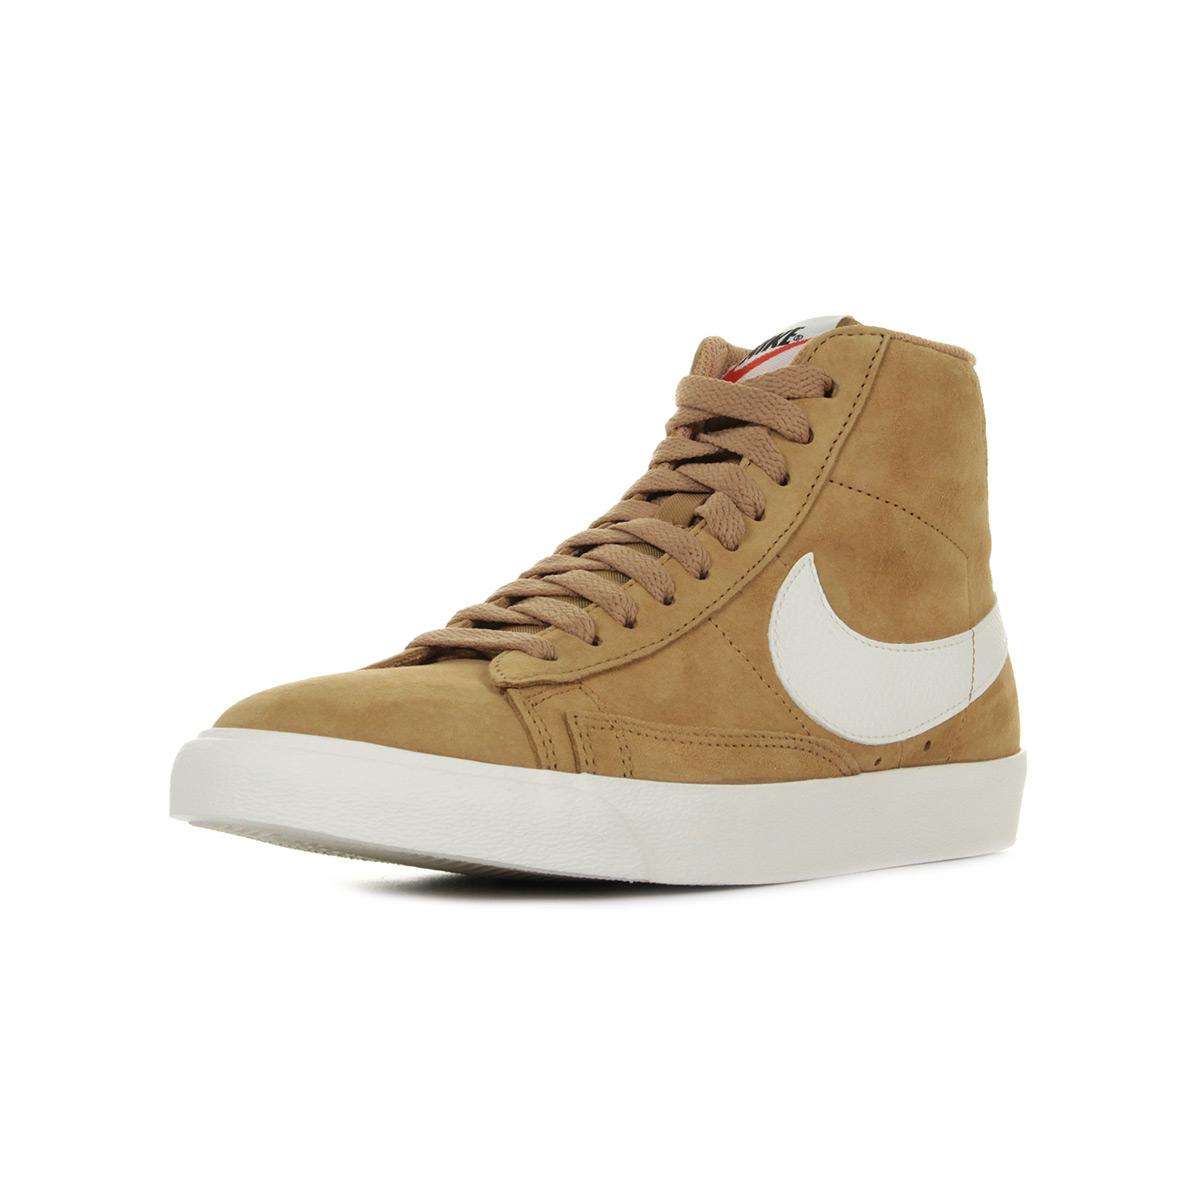 Nike Blazer Mid Vintage Suede ...